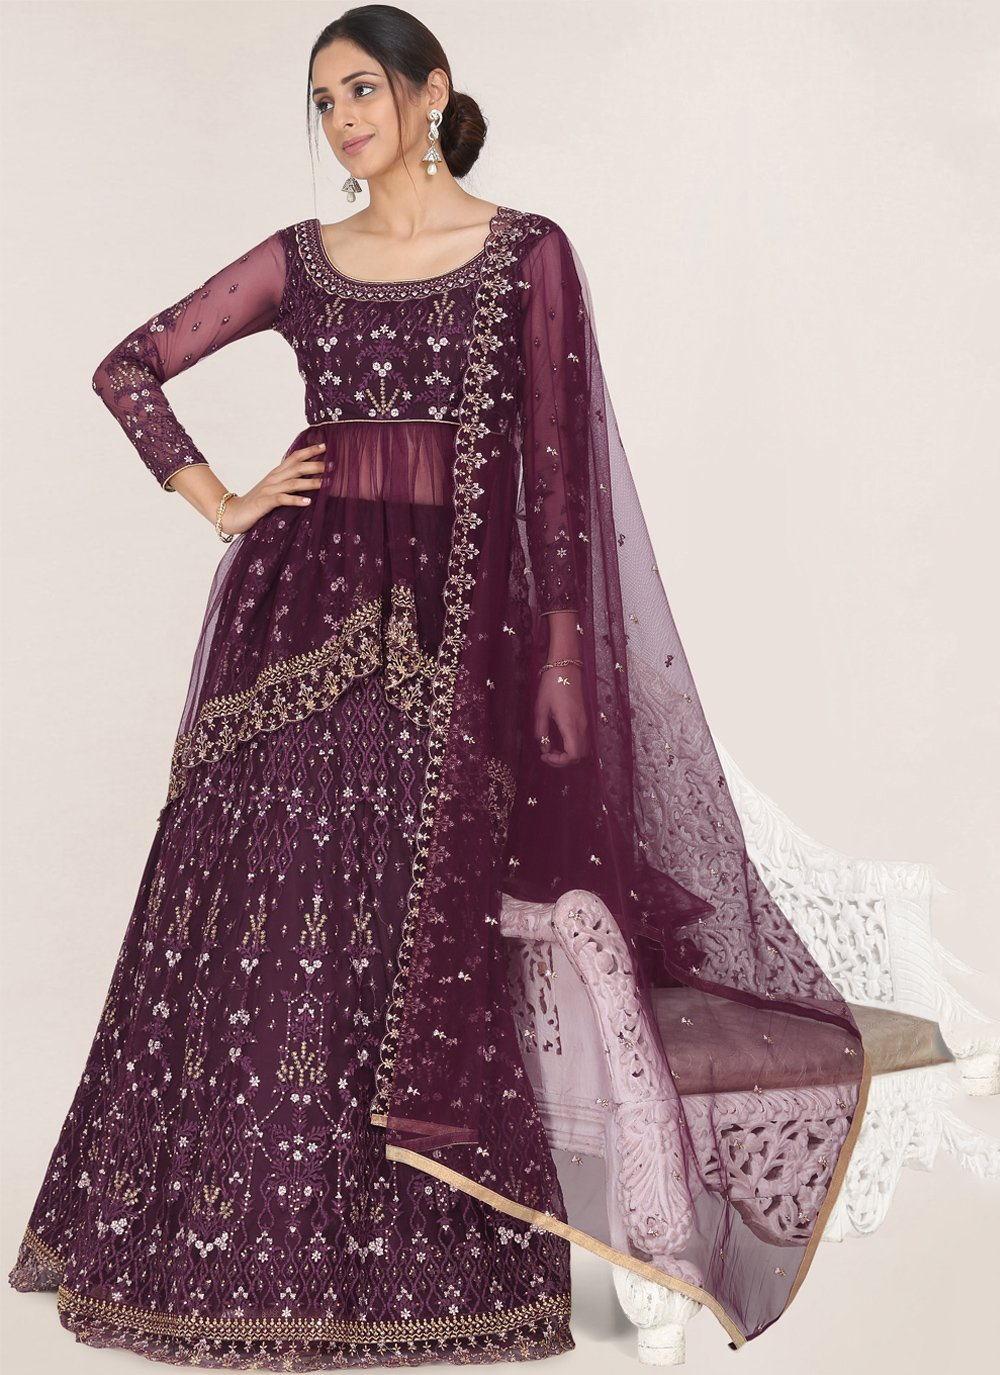 Net Wedding A Line Lehenga Choli